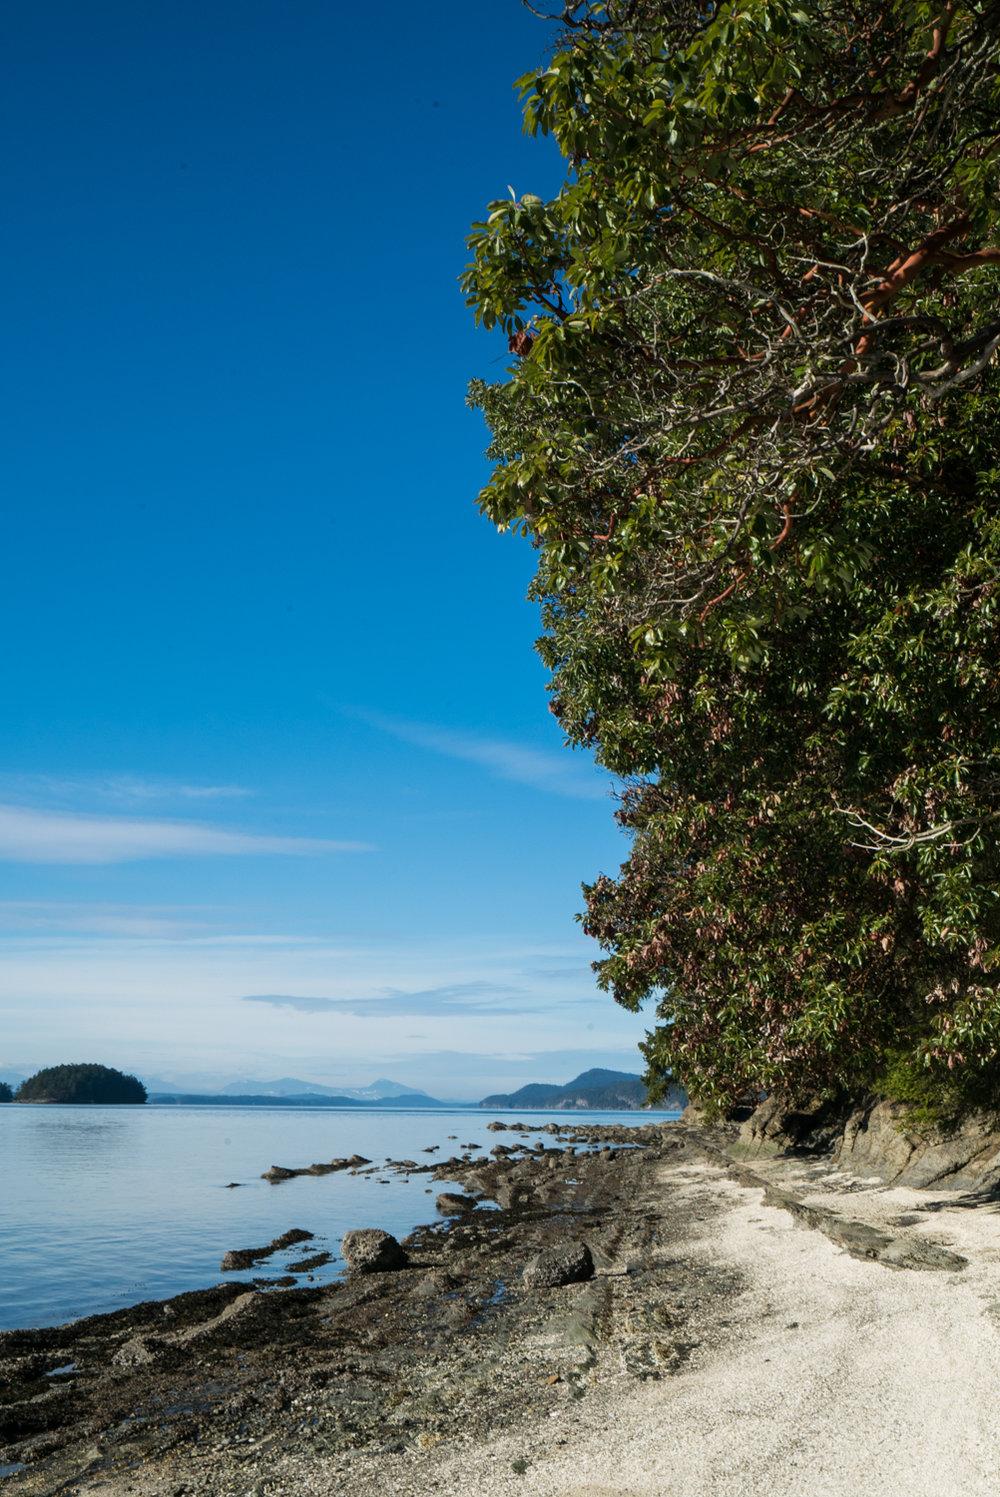 Galino-Island-Explore-BC-Bolandia-5-2.jpg